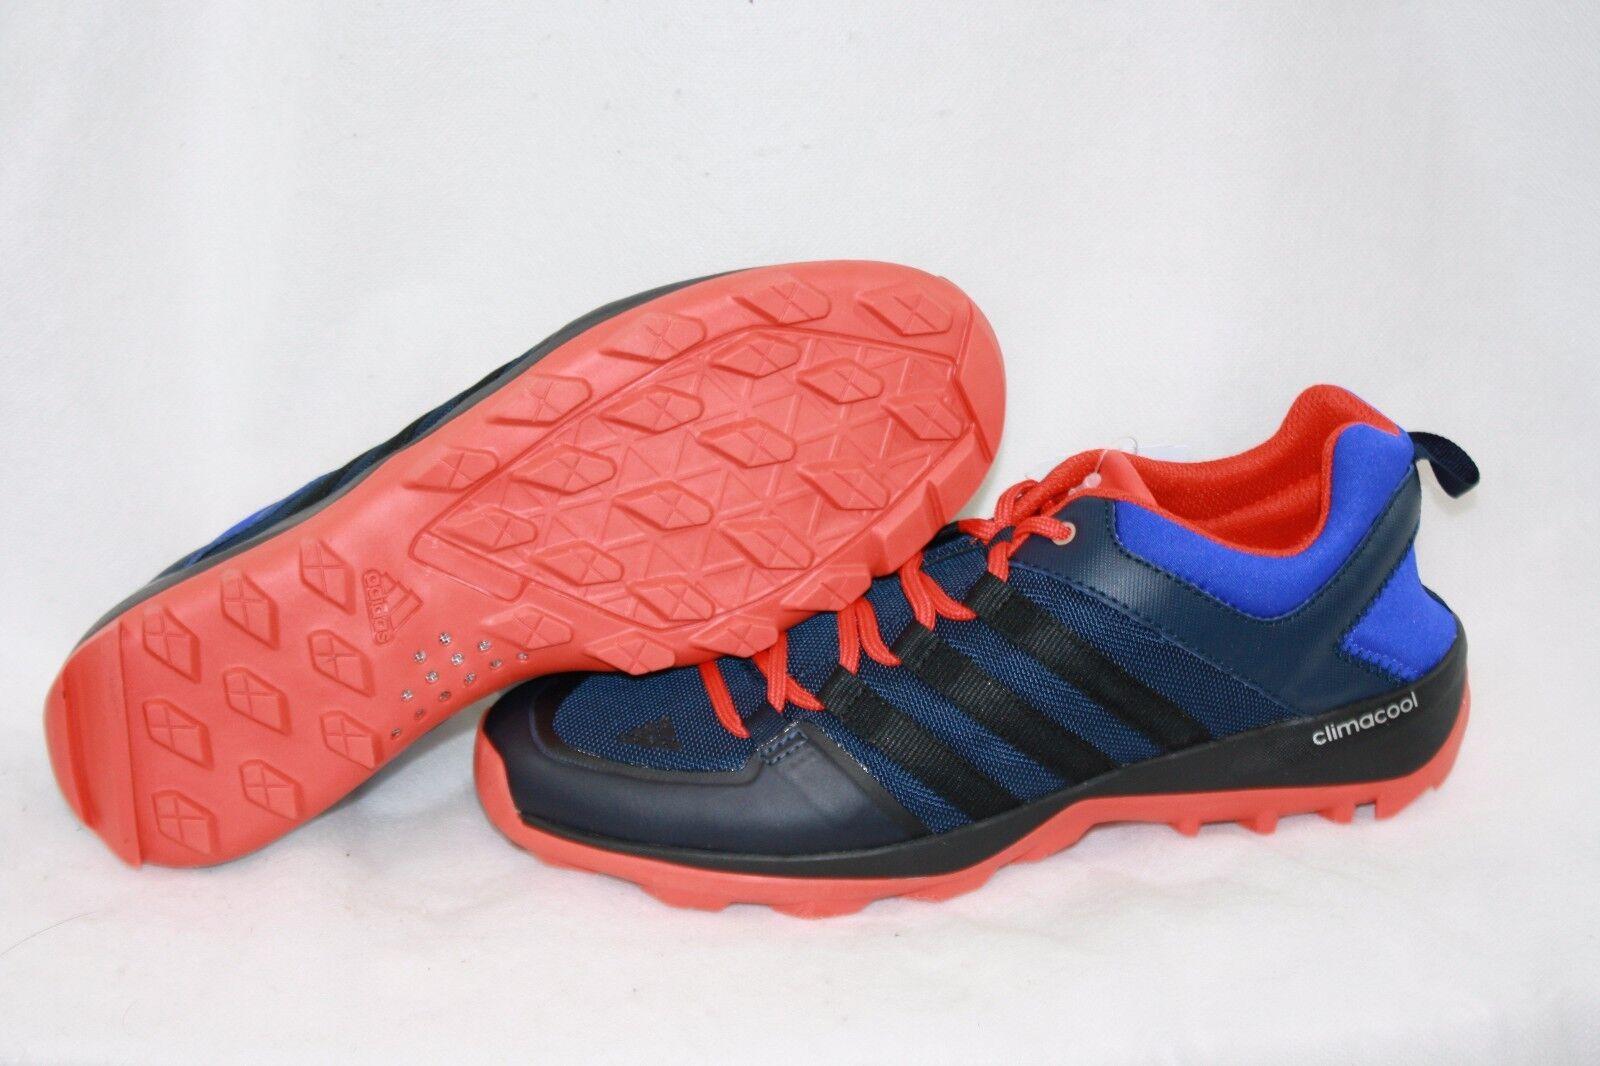 NEW Mens Sz 9 ADIDAS Daroga Plus Canvas B44330 Blue Trail Water Sneakers Shoes